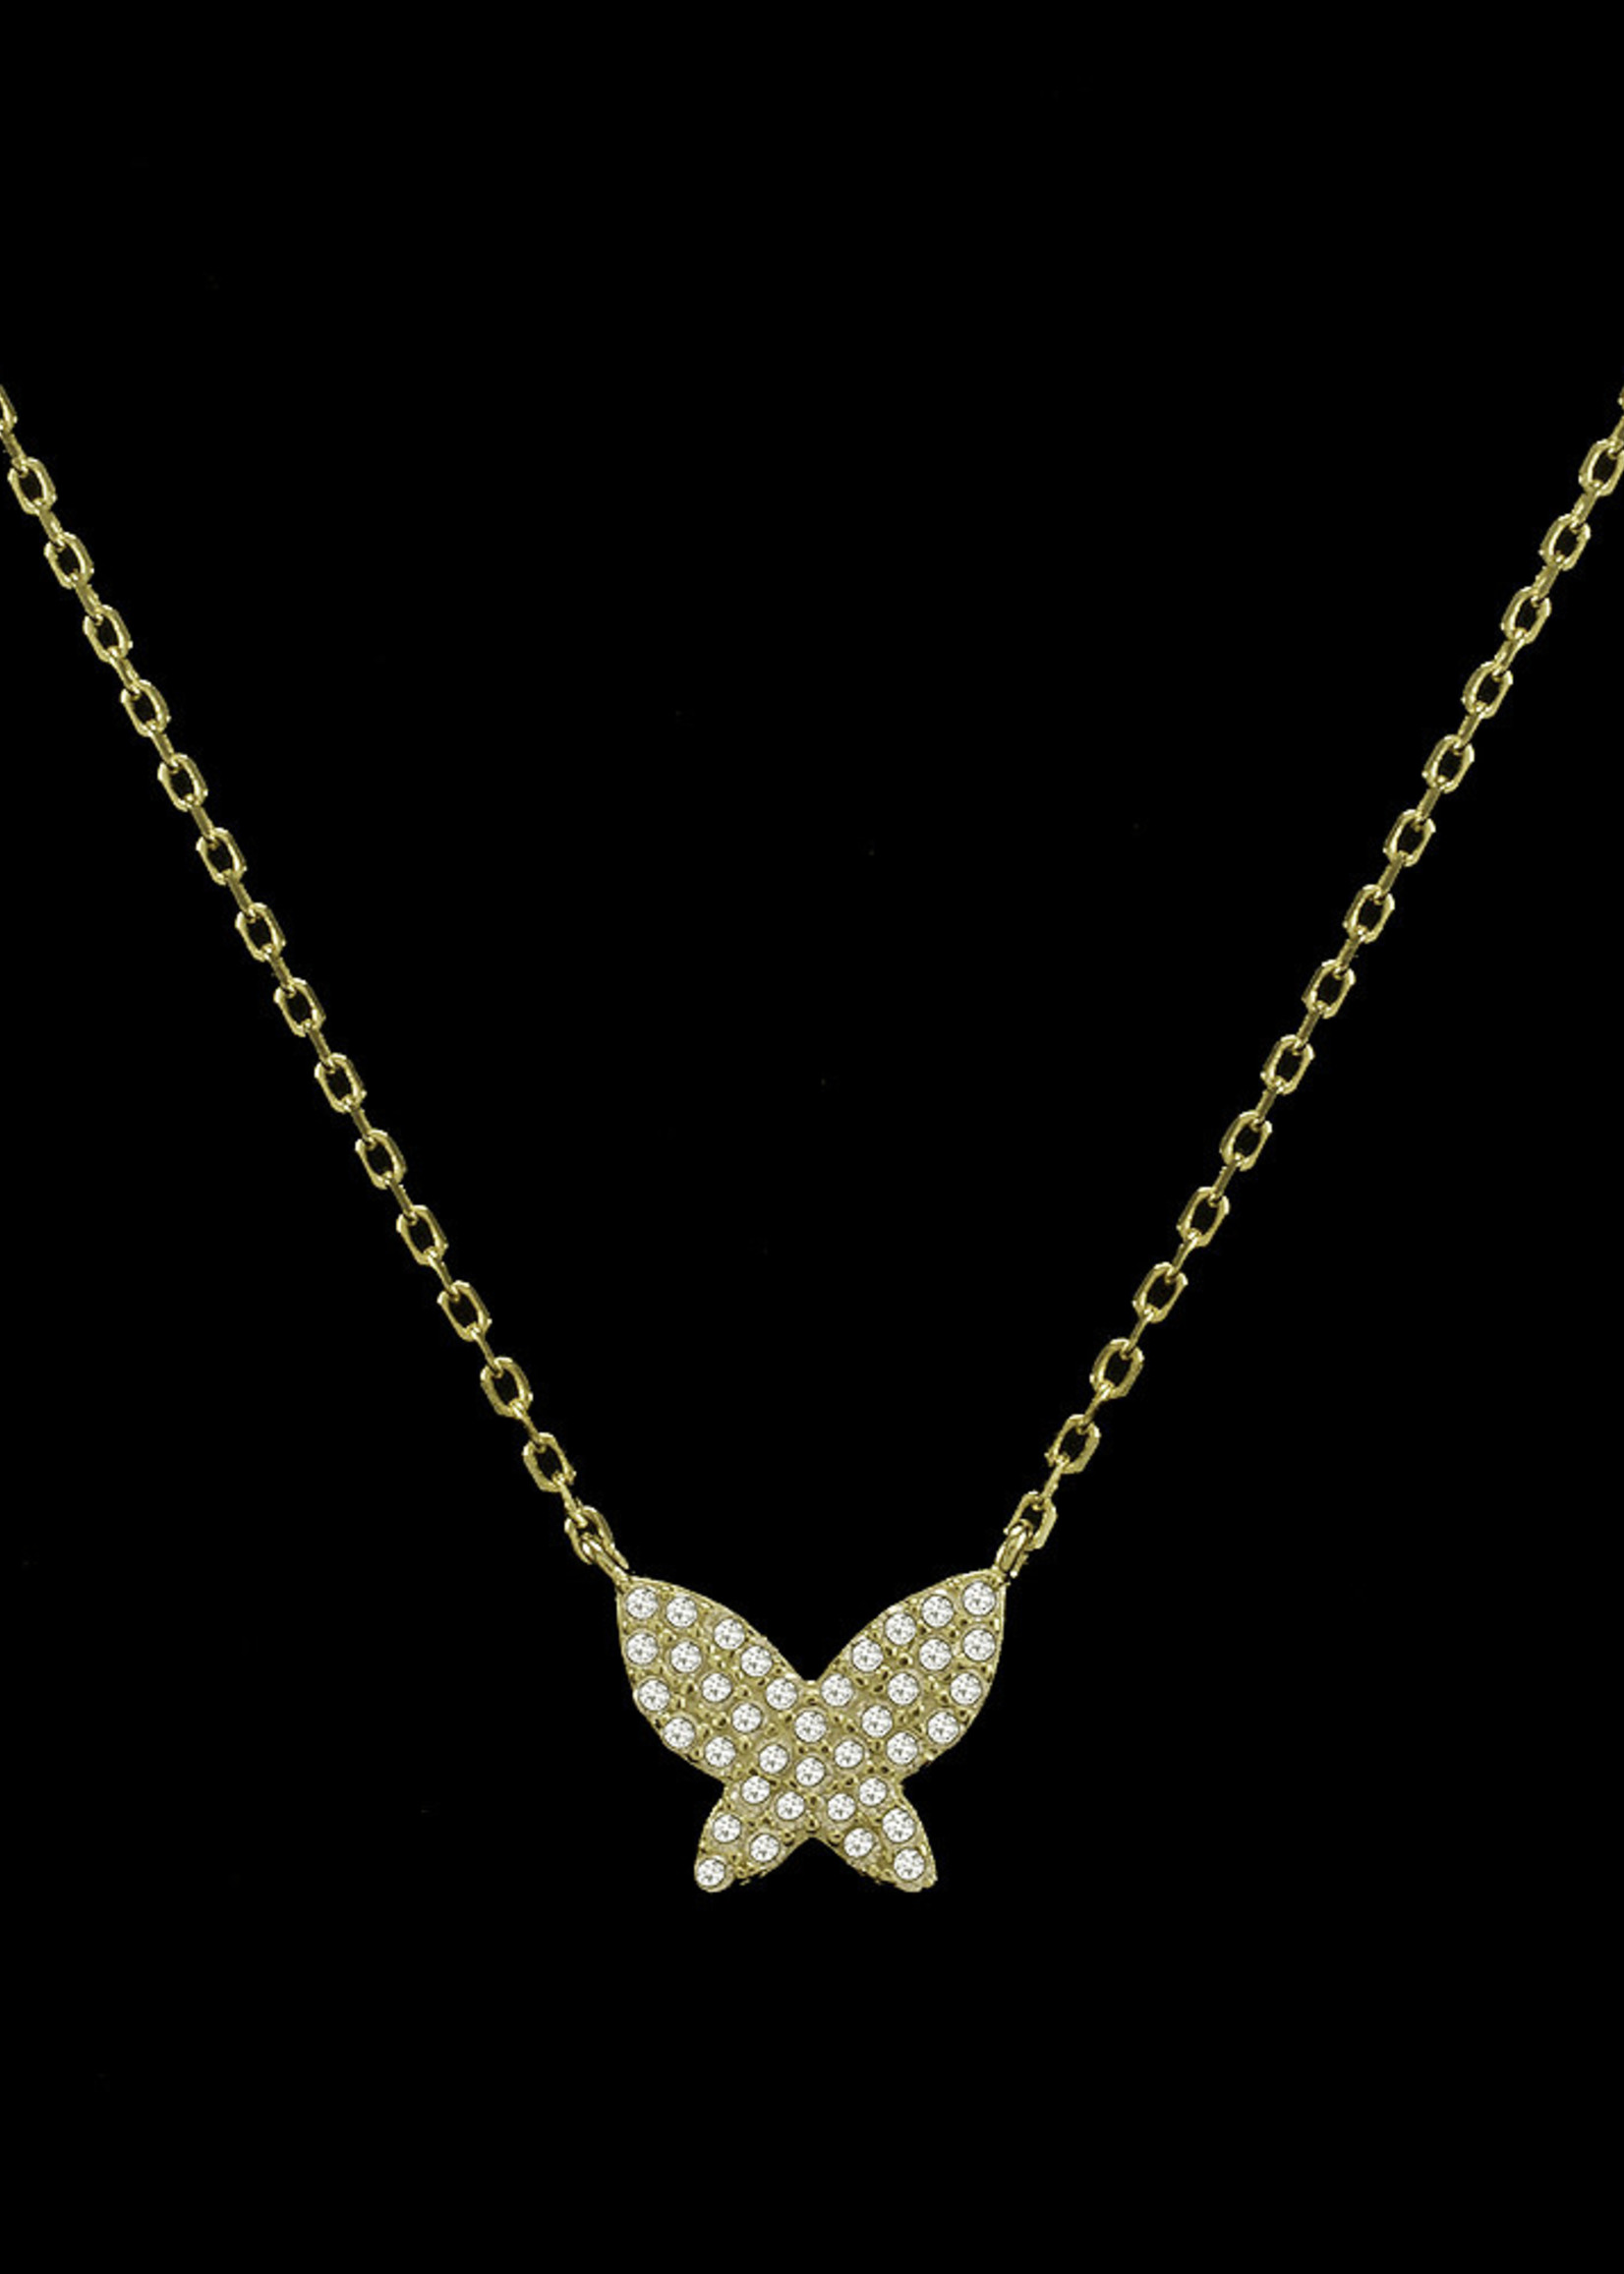 Be-Je Designs Beje - Silver Butterfly Necklace (SS602N)